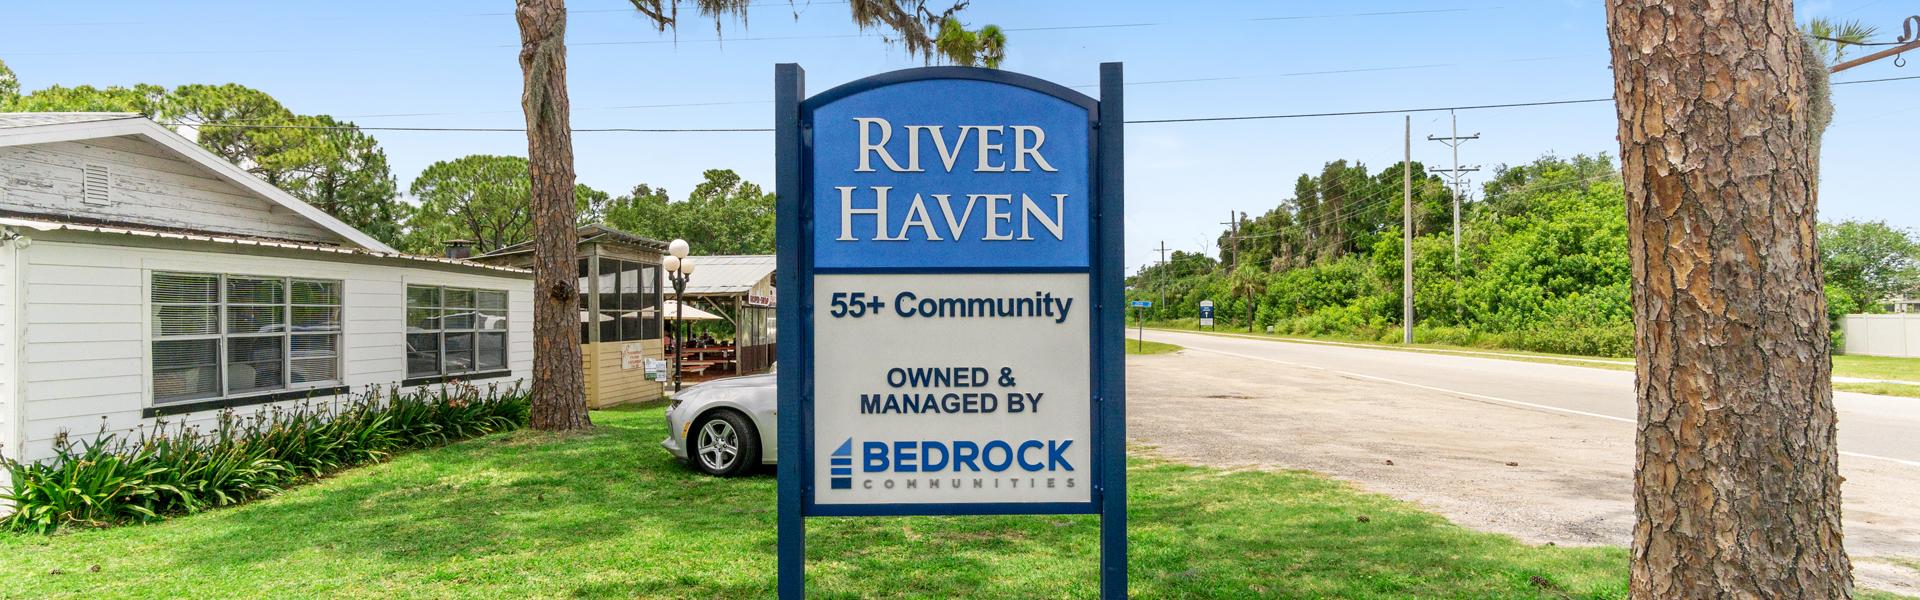 River Haven